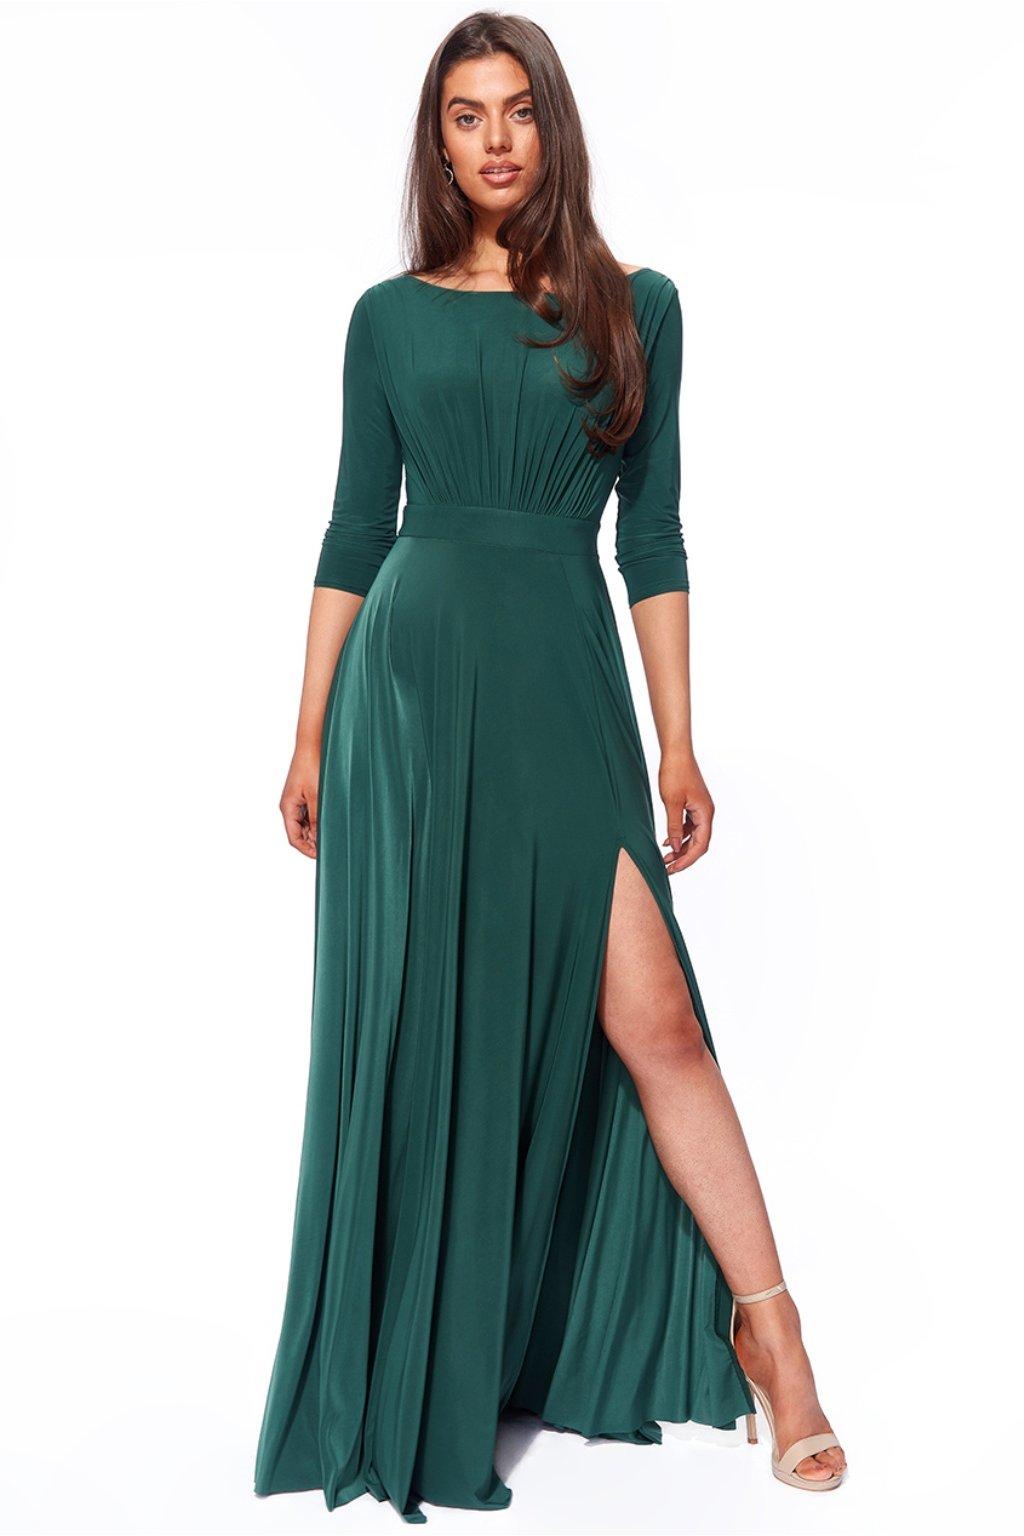 Zelené dlhé šaty s rukávmi